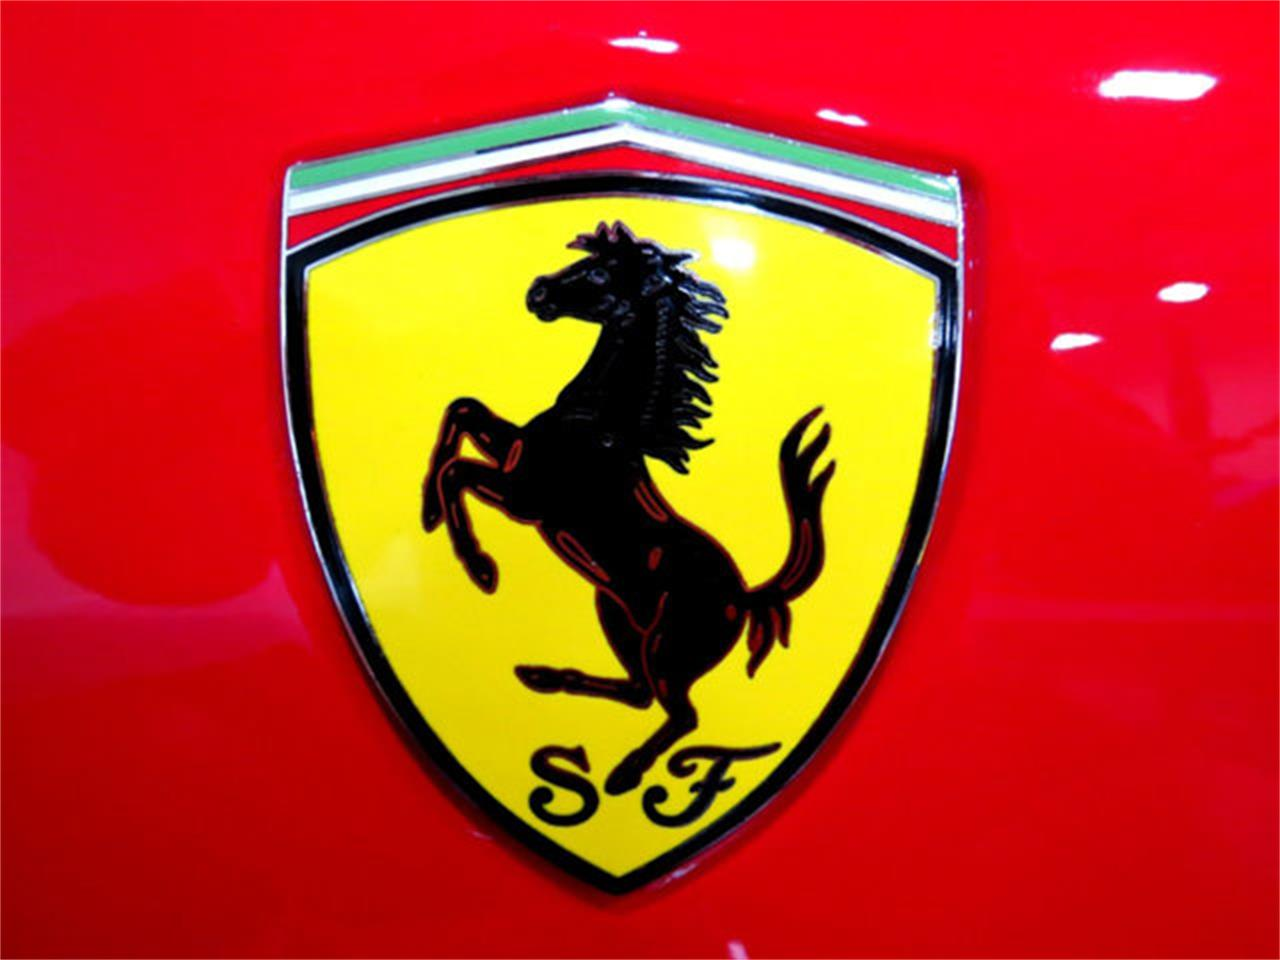 2002 Ferrari 360 (CC-1263859) for sale in Burlingame, California